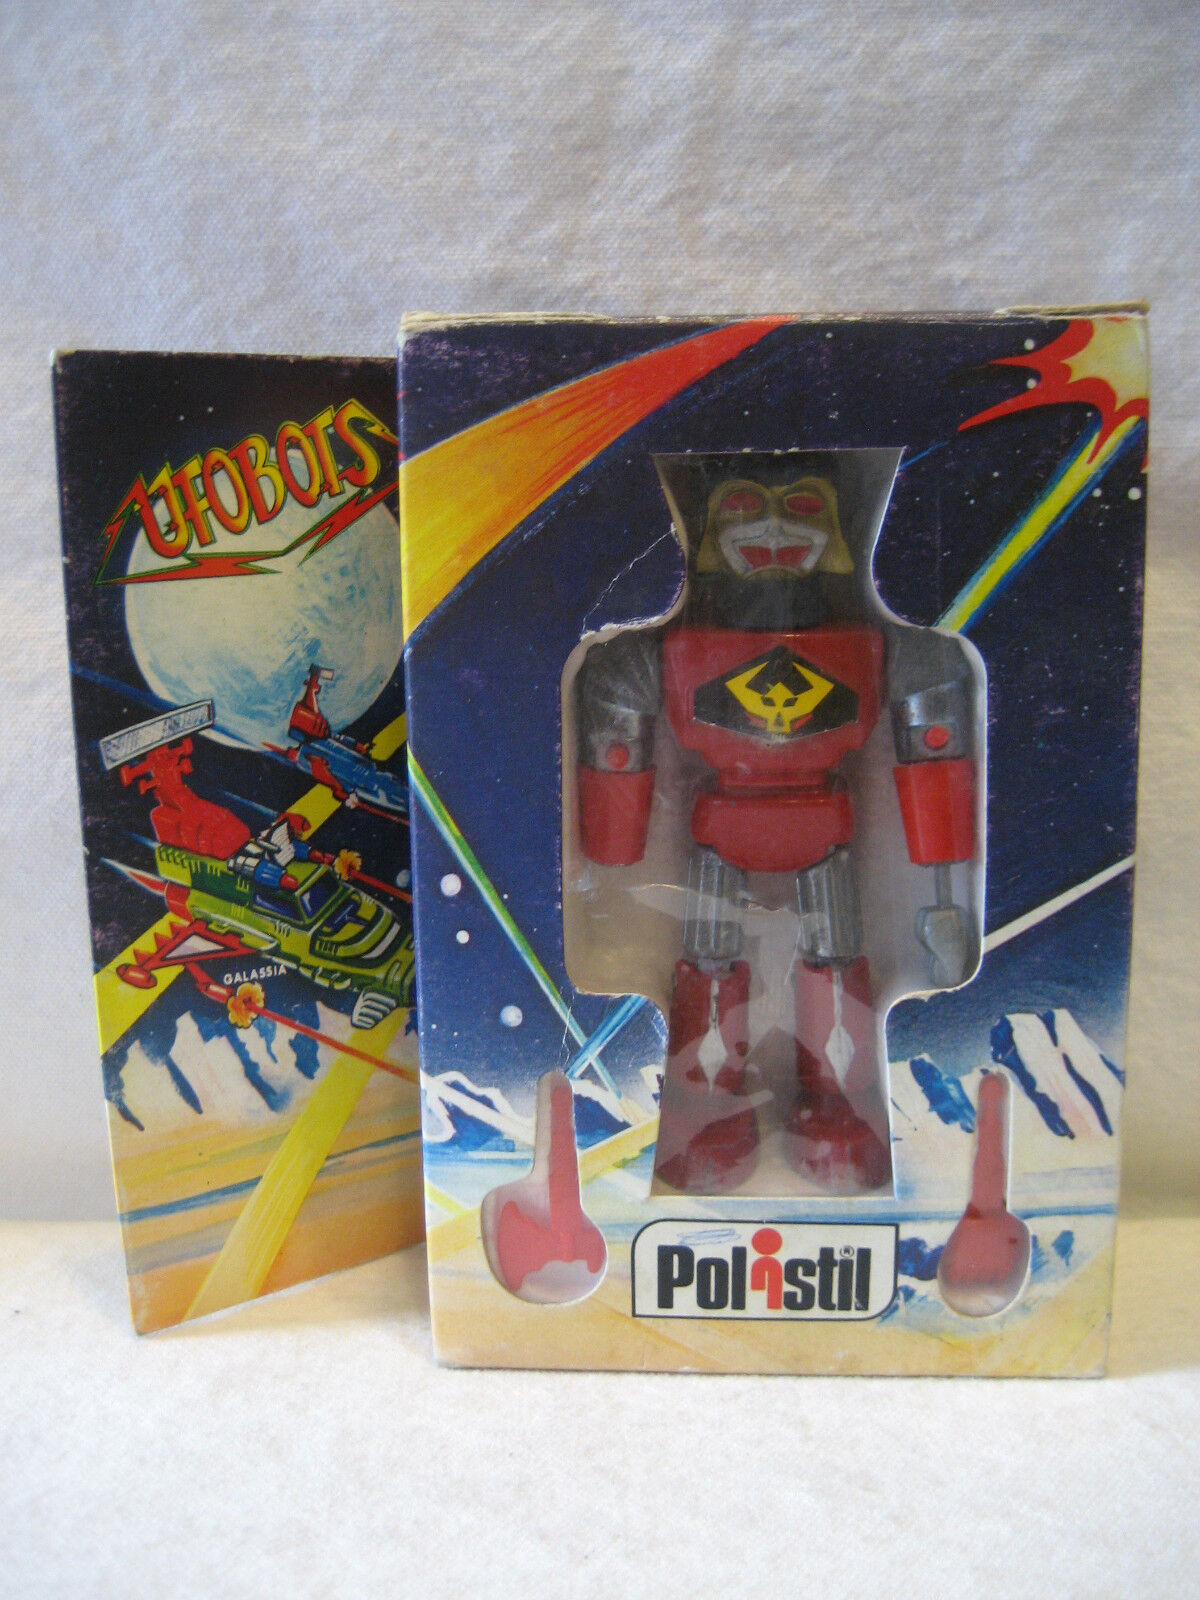 MIB vintage Italian UFOBOTS chogokin diecase metal giocattolo 4  RARE Polistil ROBOT